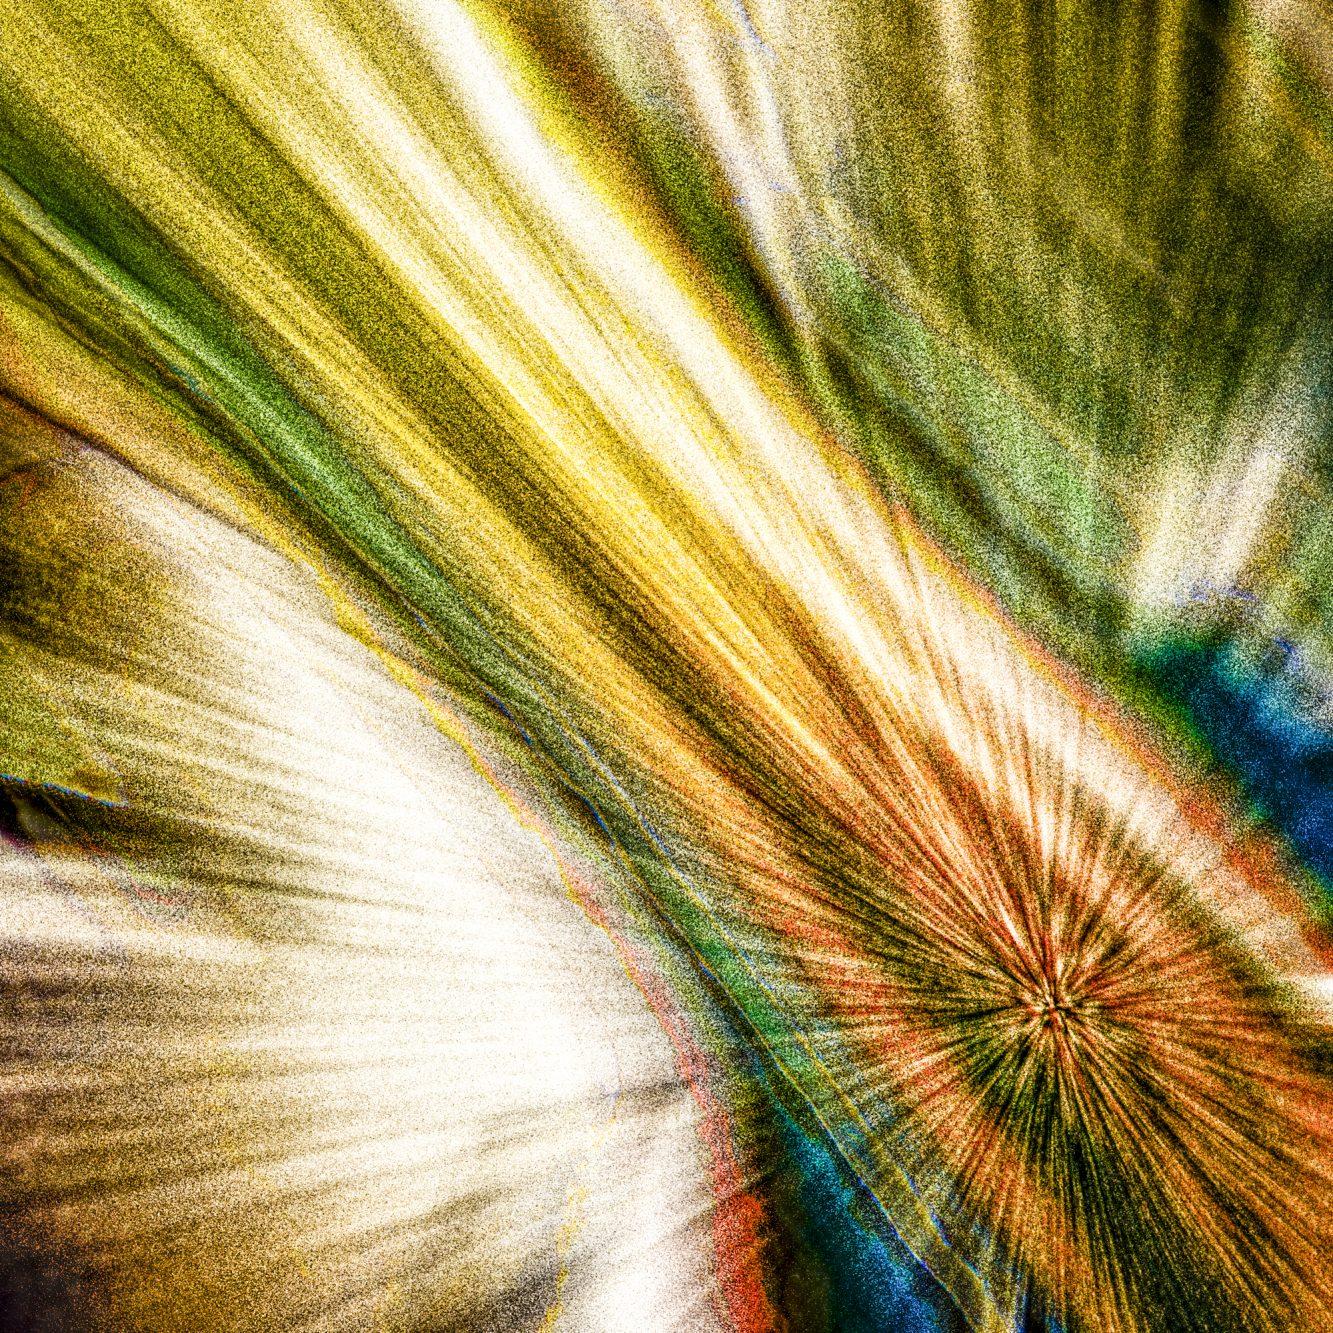 glass-photo-art-5593-bewerkt